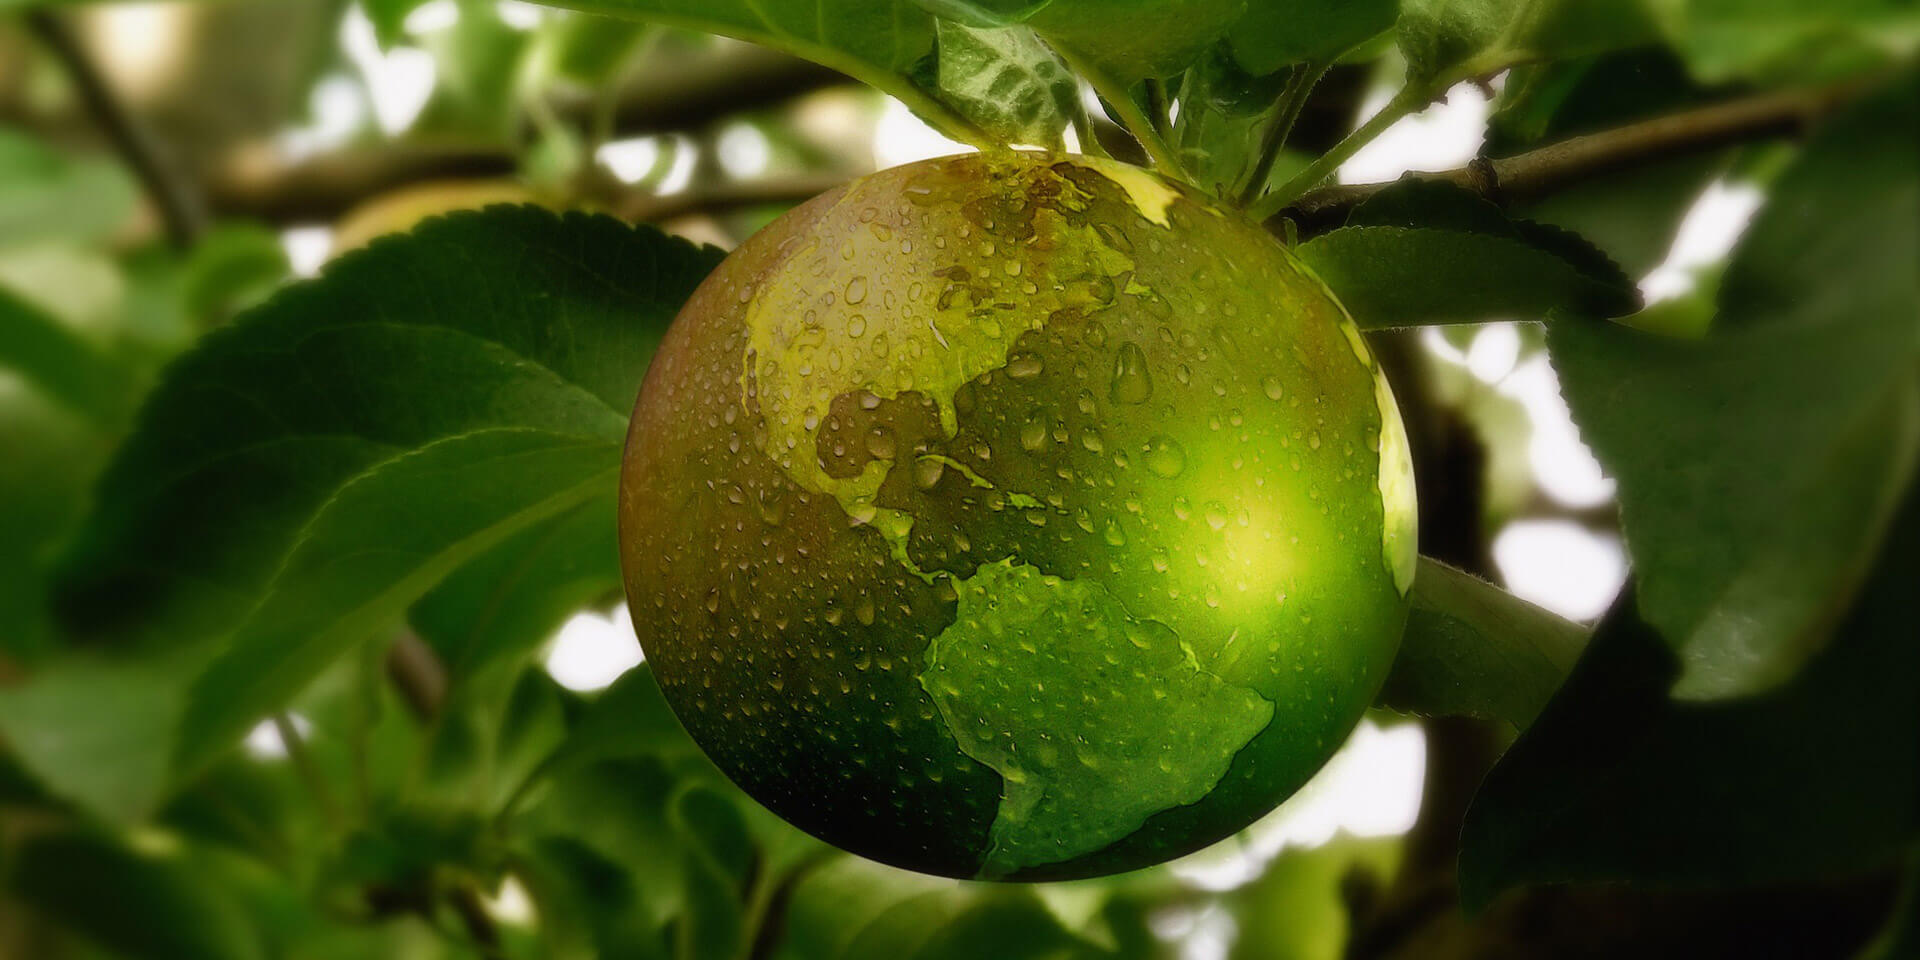 Apfel im Baum als Weltkugel